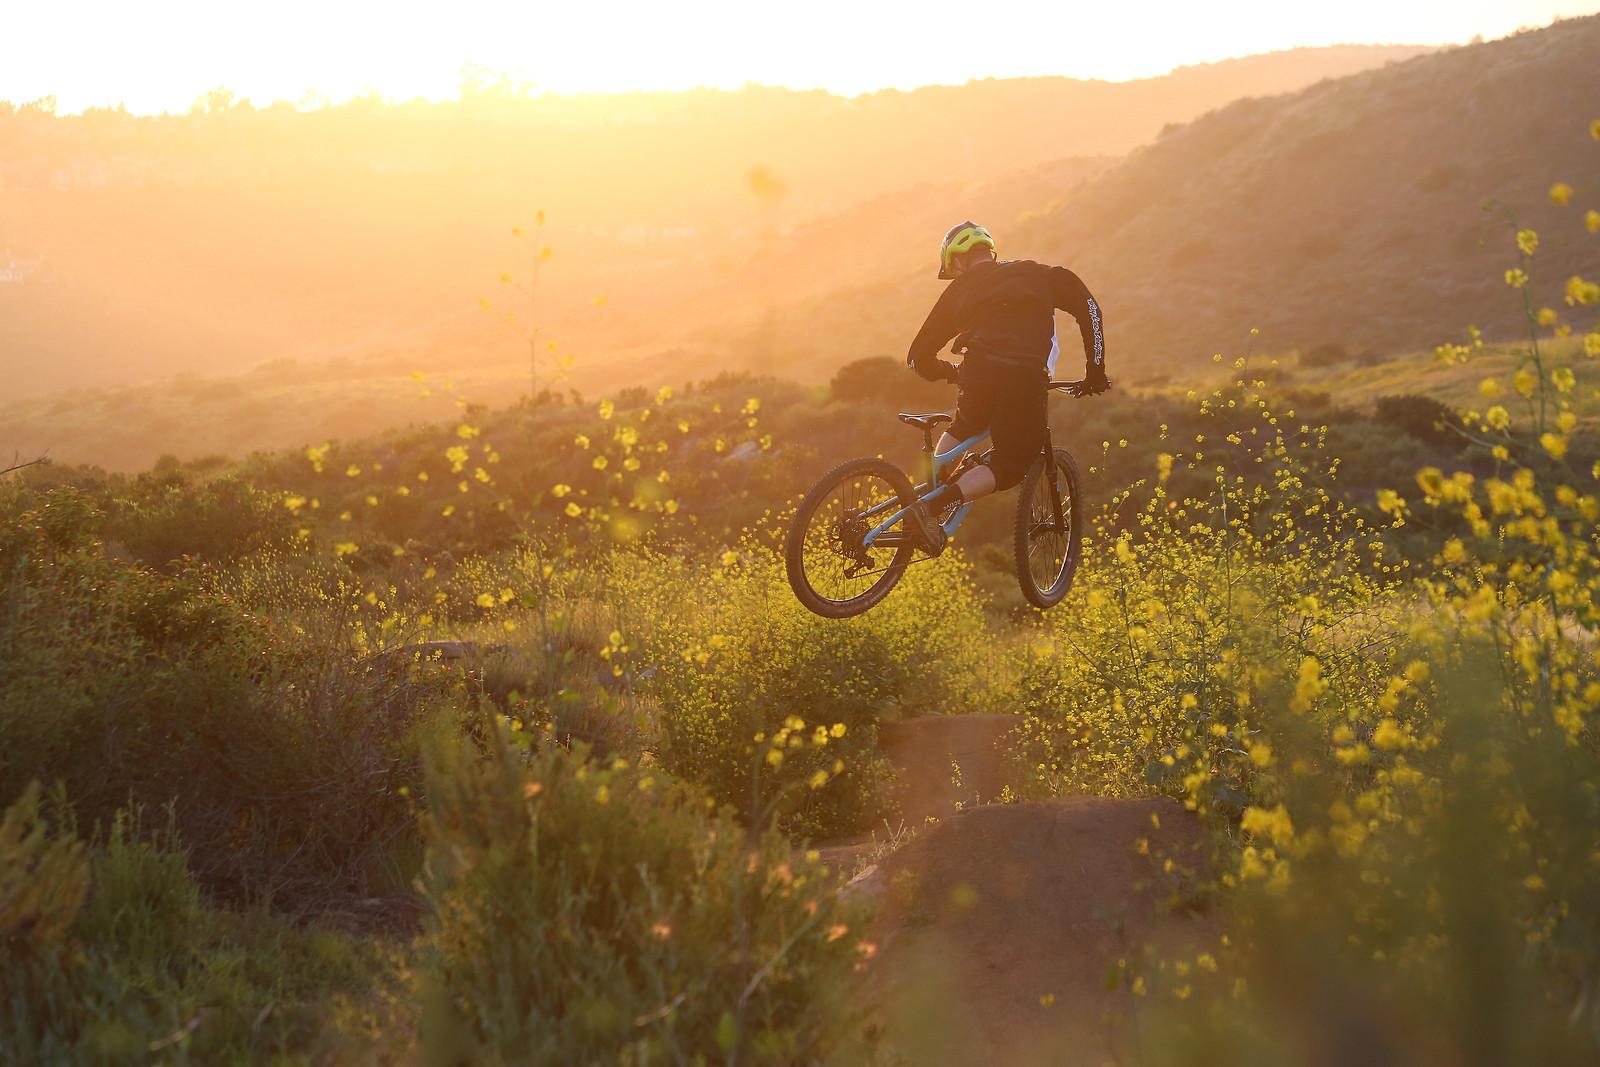 IMG 9540e5gkp4-017 - @_gabekeating_ - Mountain Biking Pictures - Vital MTB